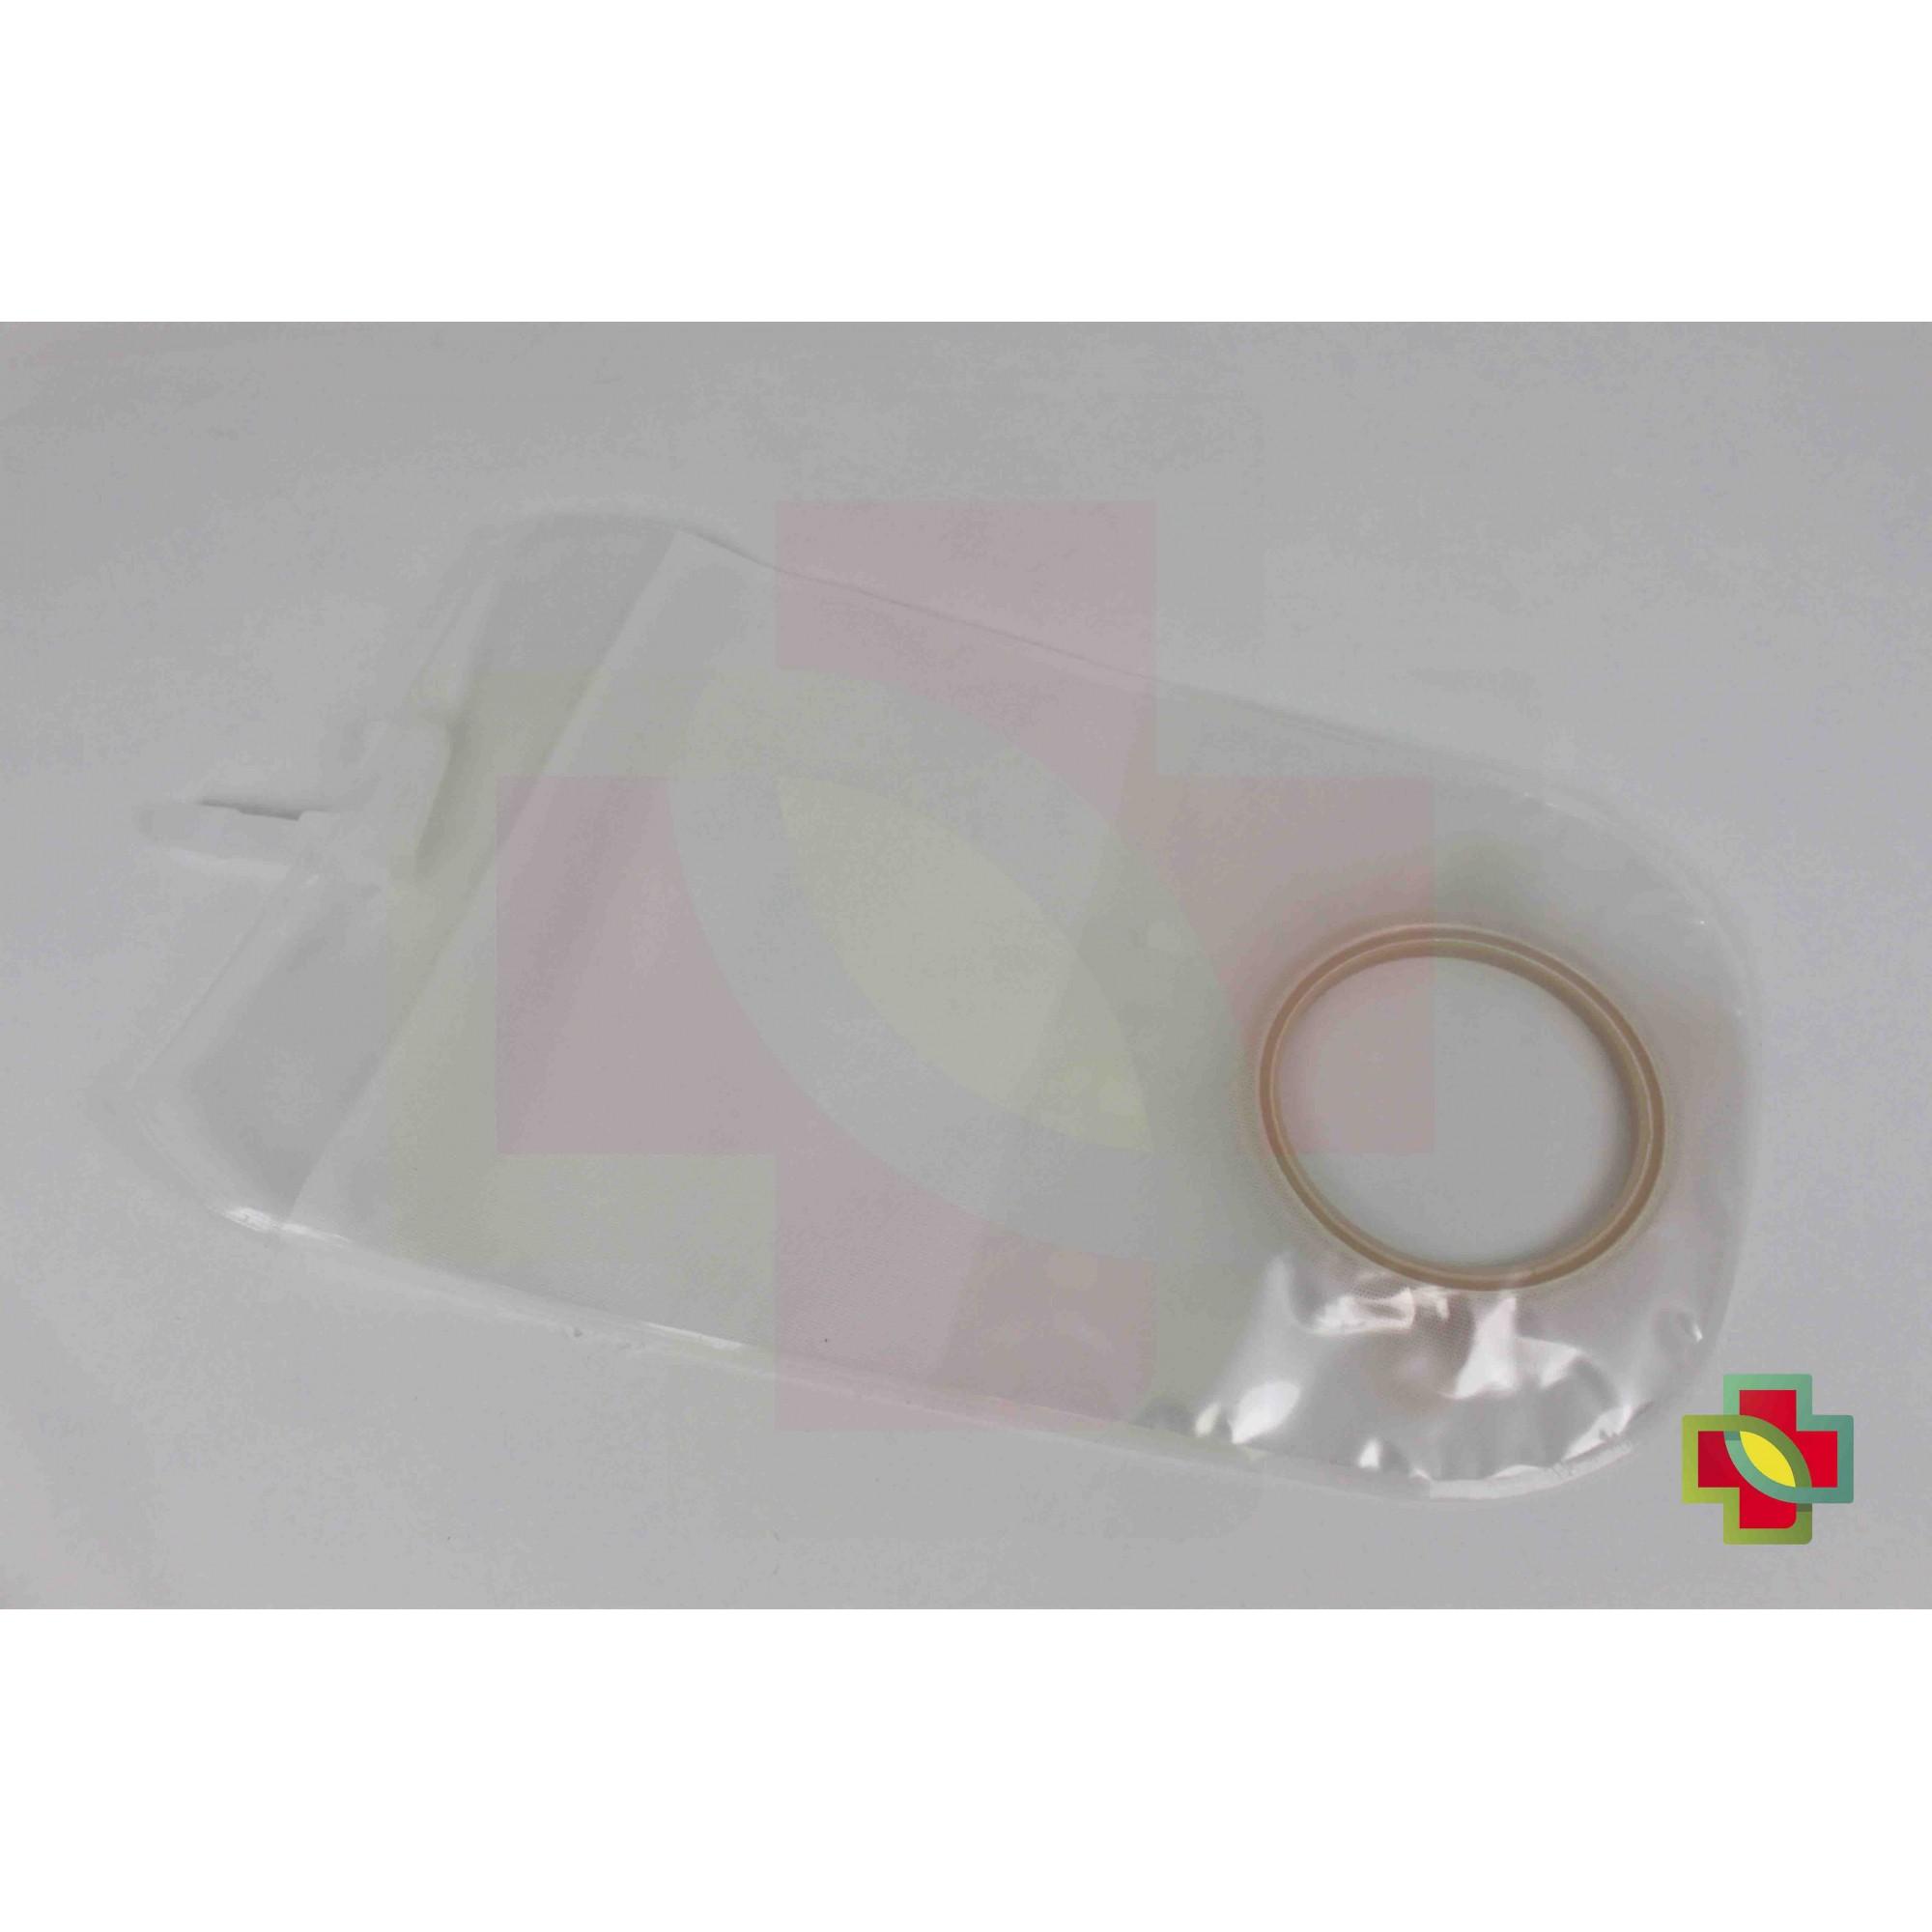 BOLSA DE UROSTOMIA SUR-FIT PLUS ANTI-REFLUXO TRANSP.57MM (UND.) 402551 - CONVATEC